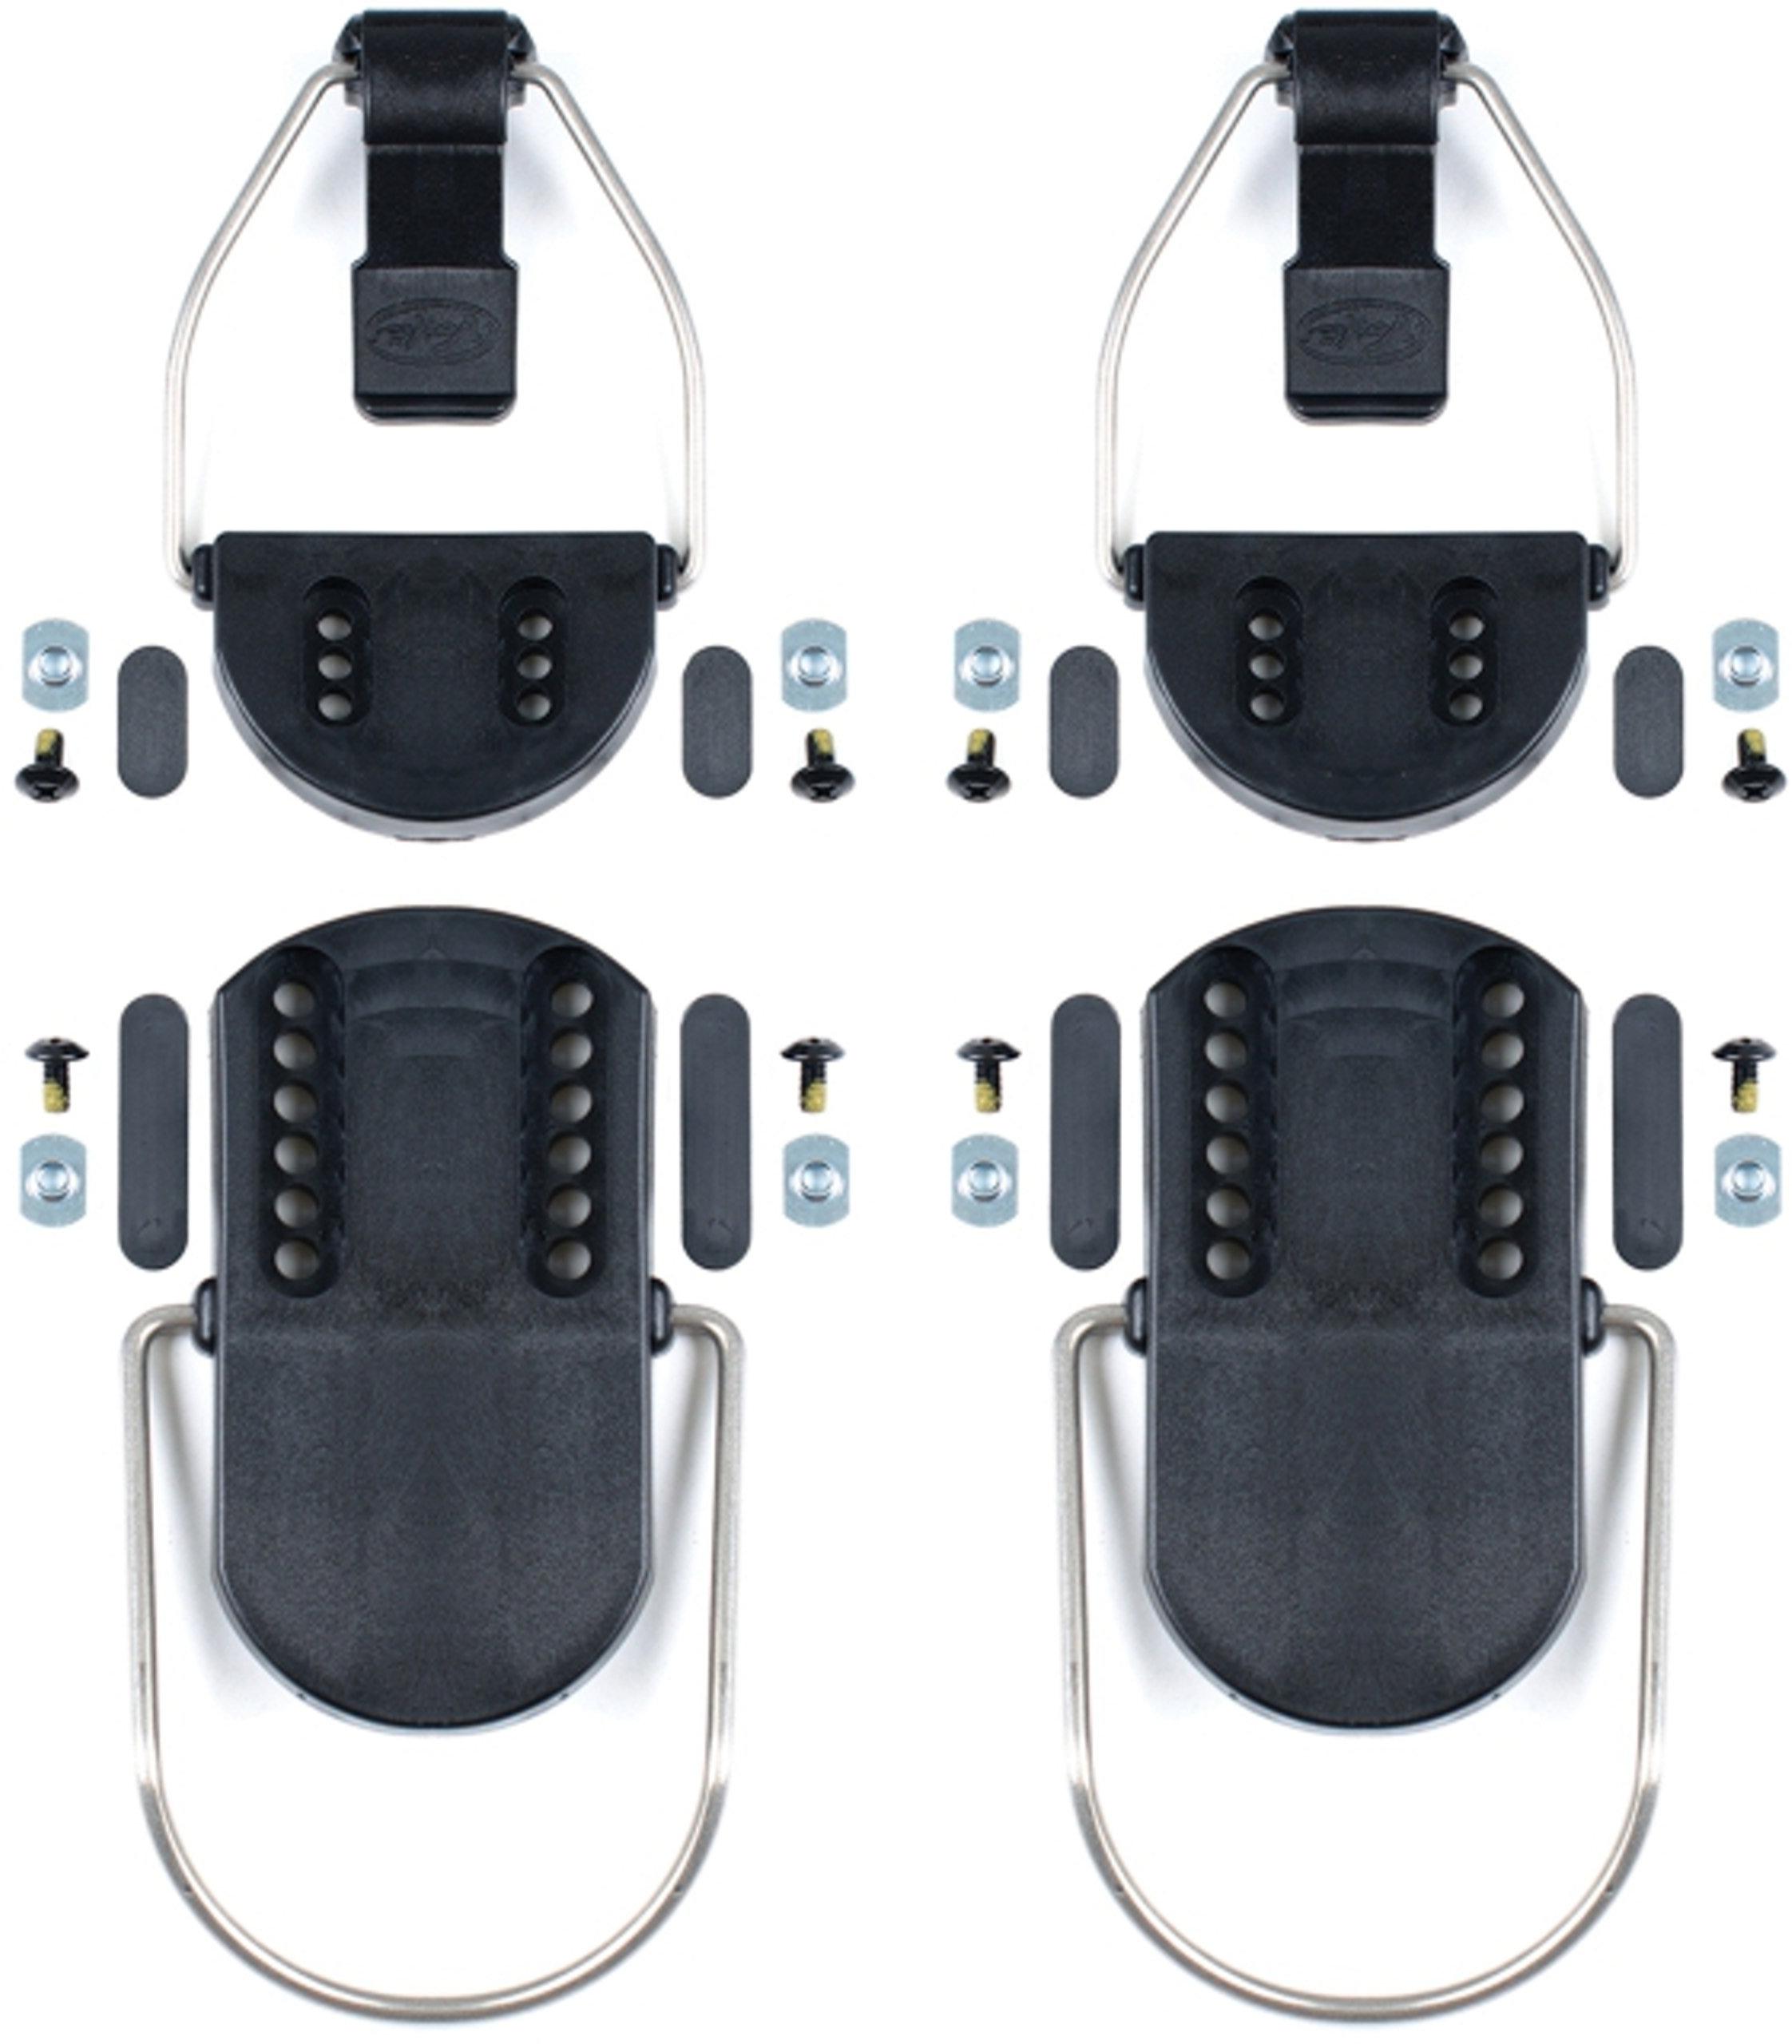 Voile Hard Boot Bindings